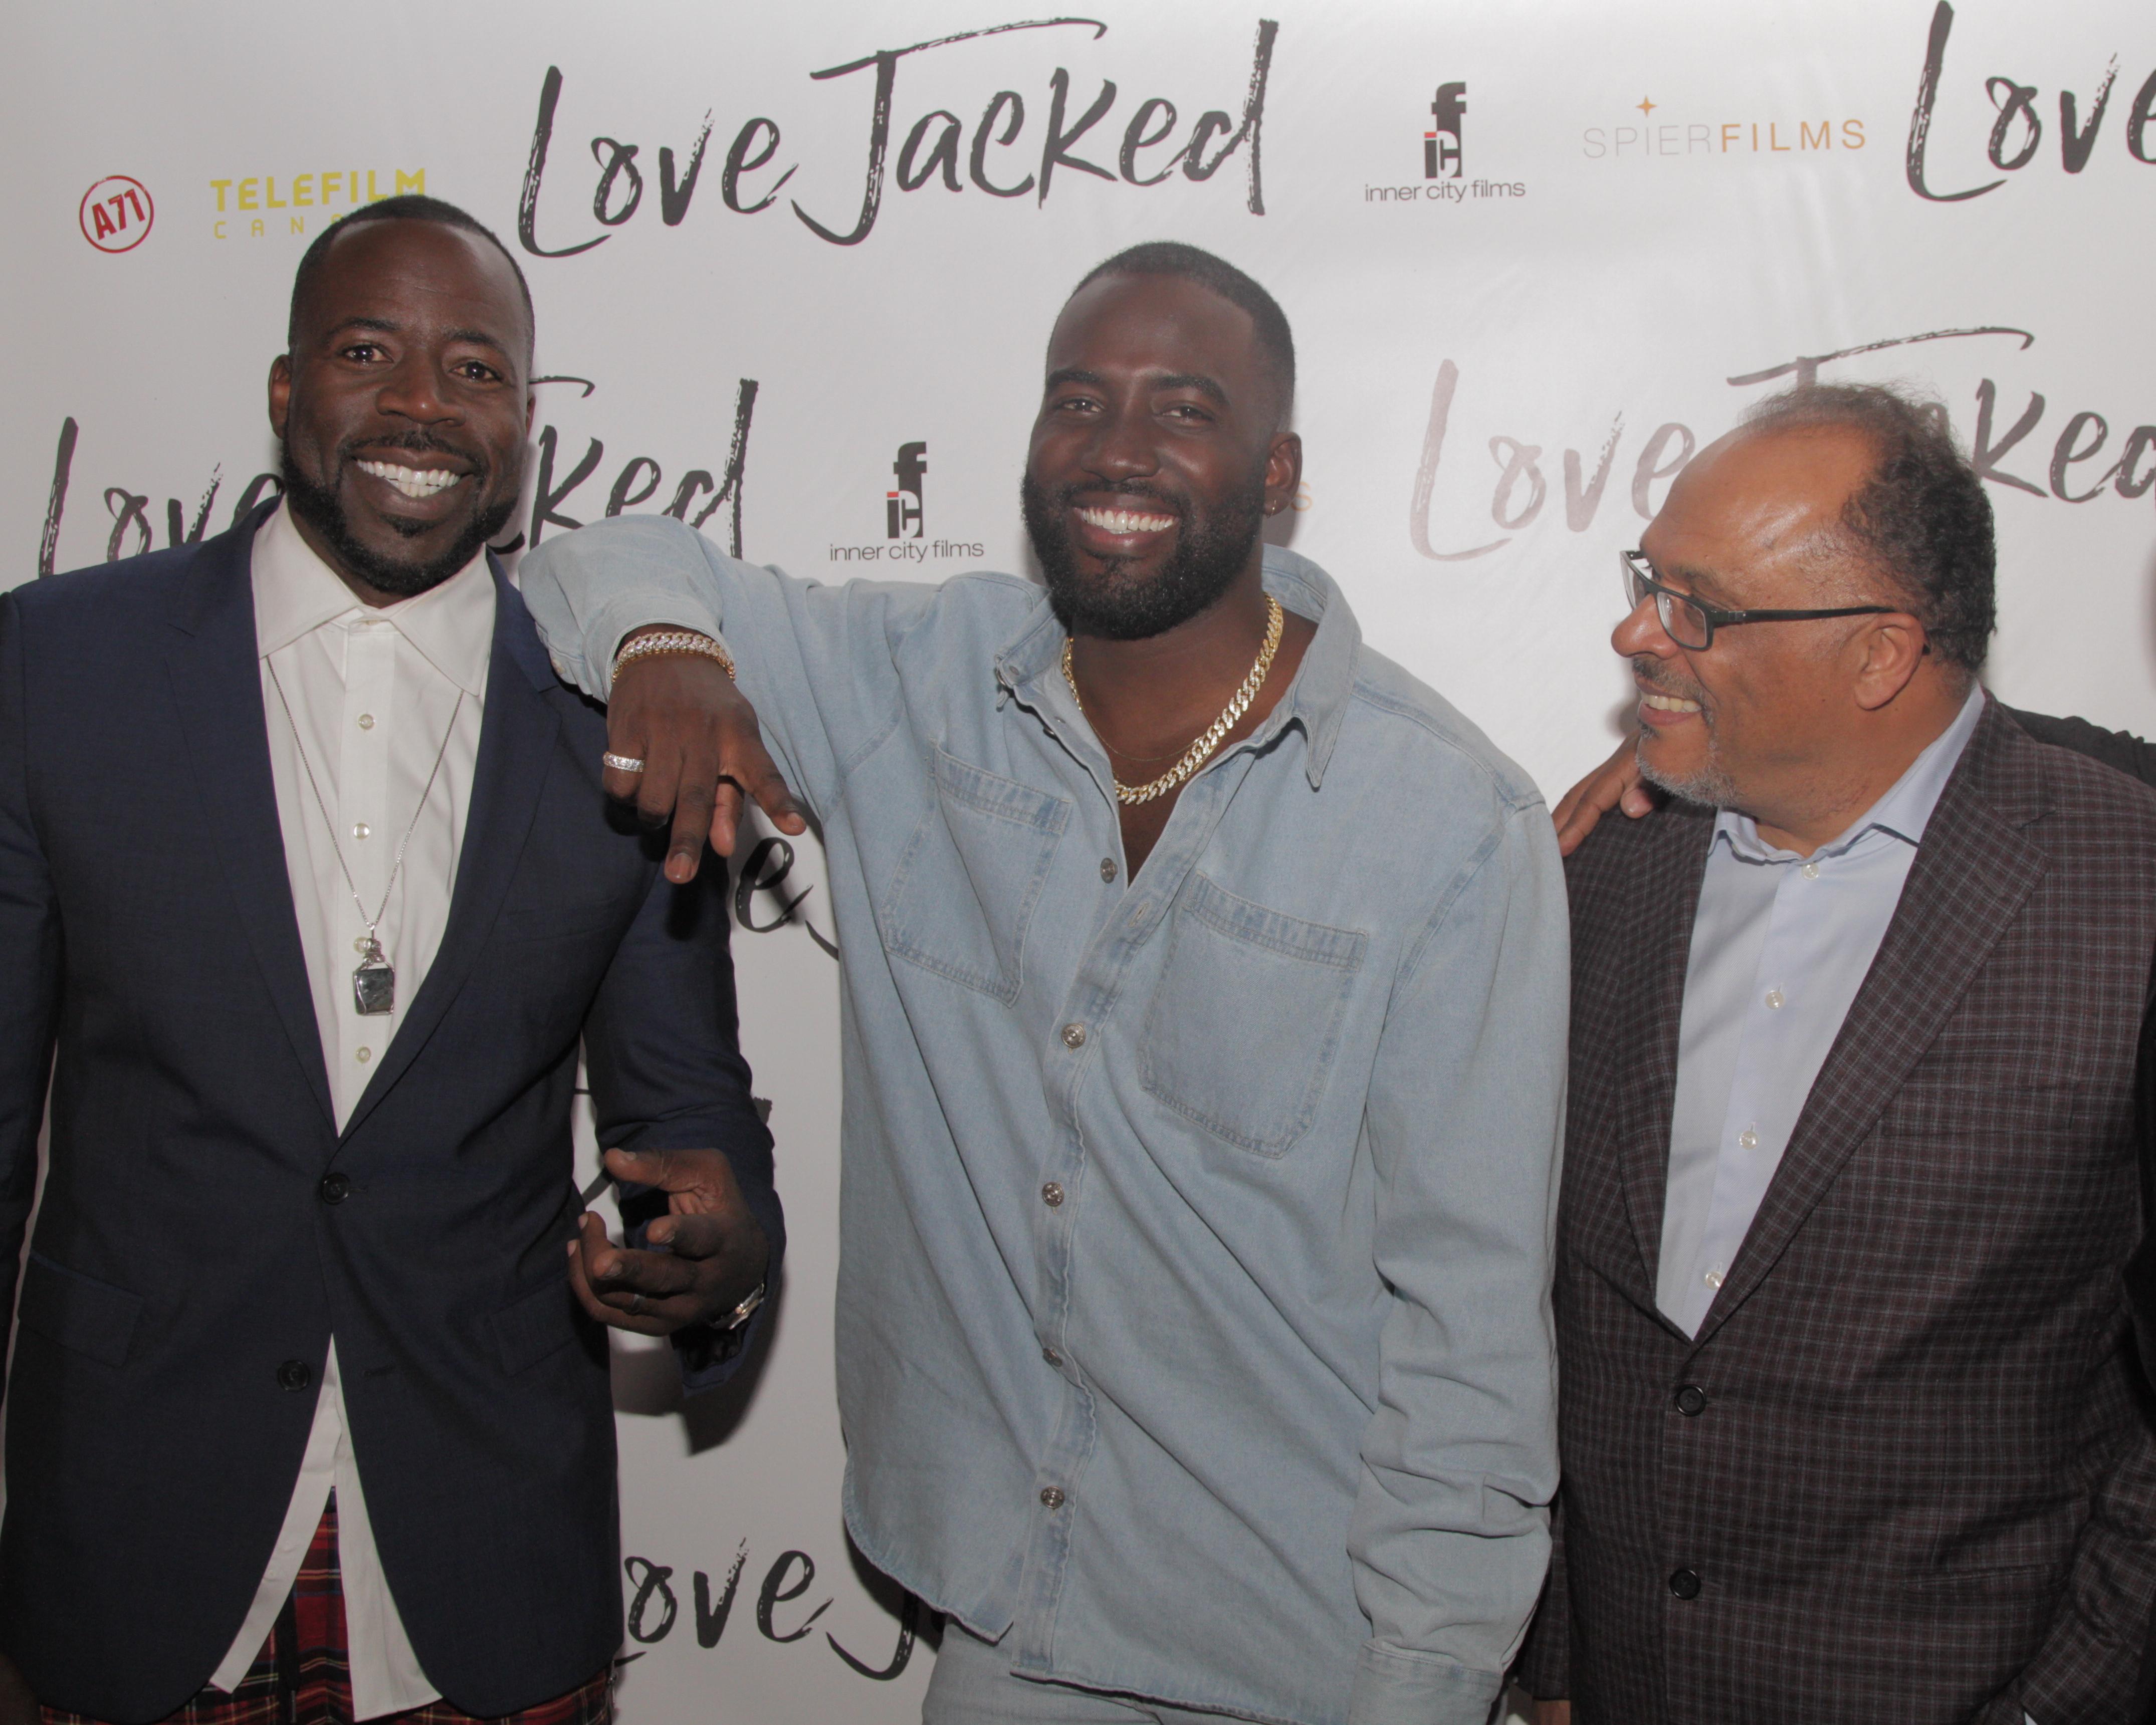 Love Jacked NYC Screening